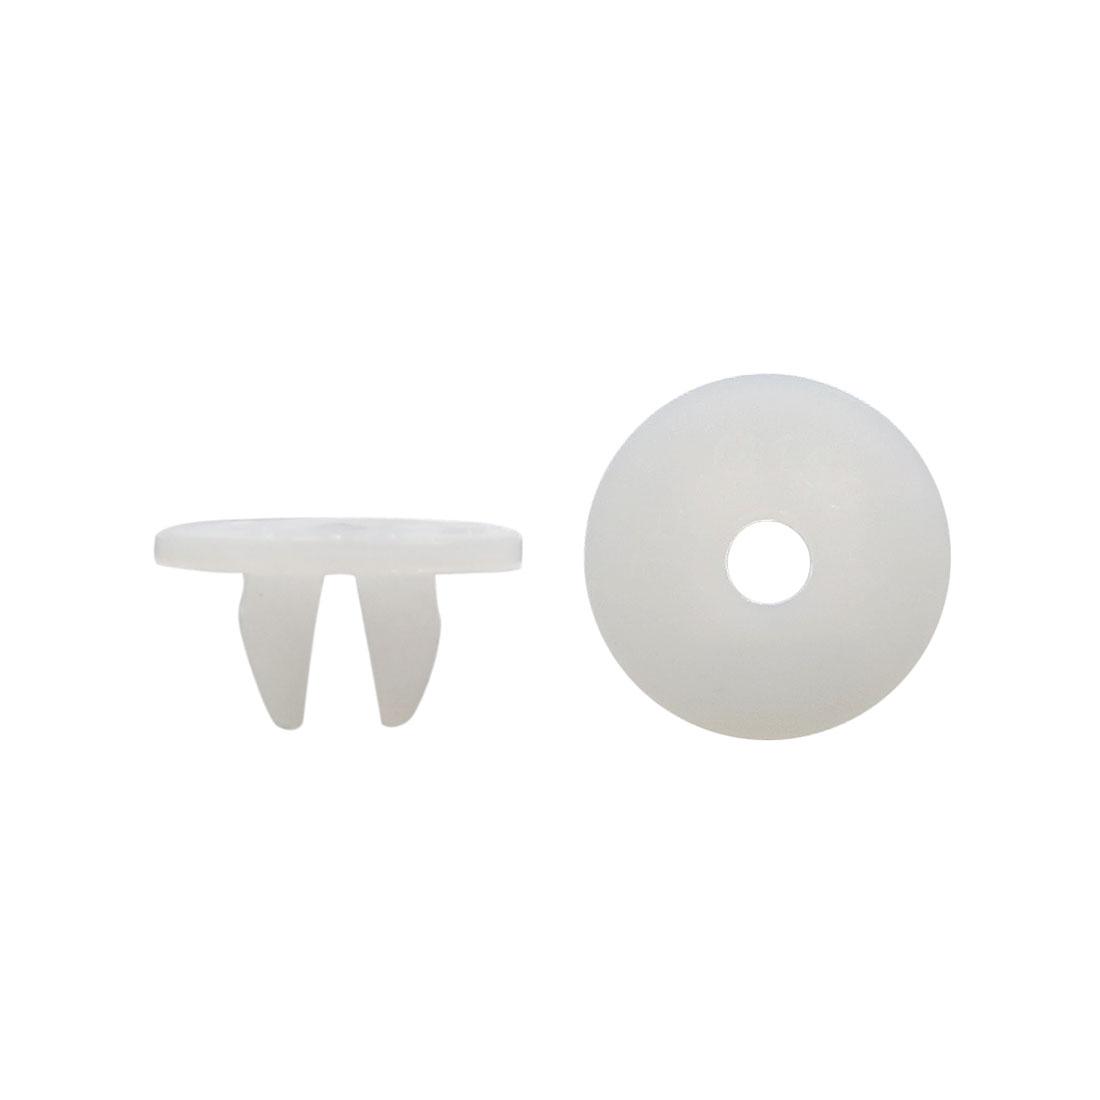 50 Pcs 8mm x 7mm Hole Dia Plastic White Rivets Bumper Door Fastener Clips